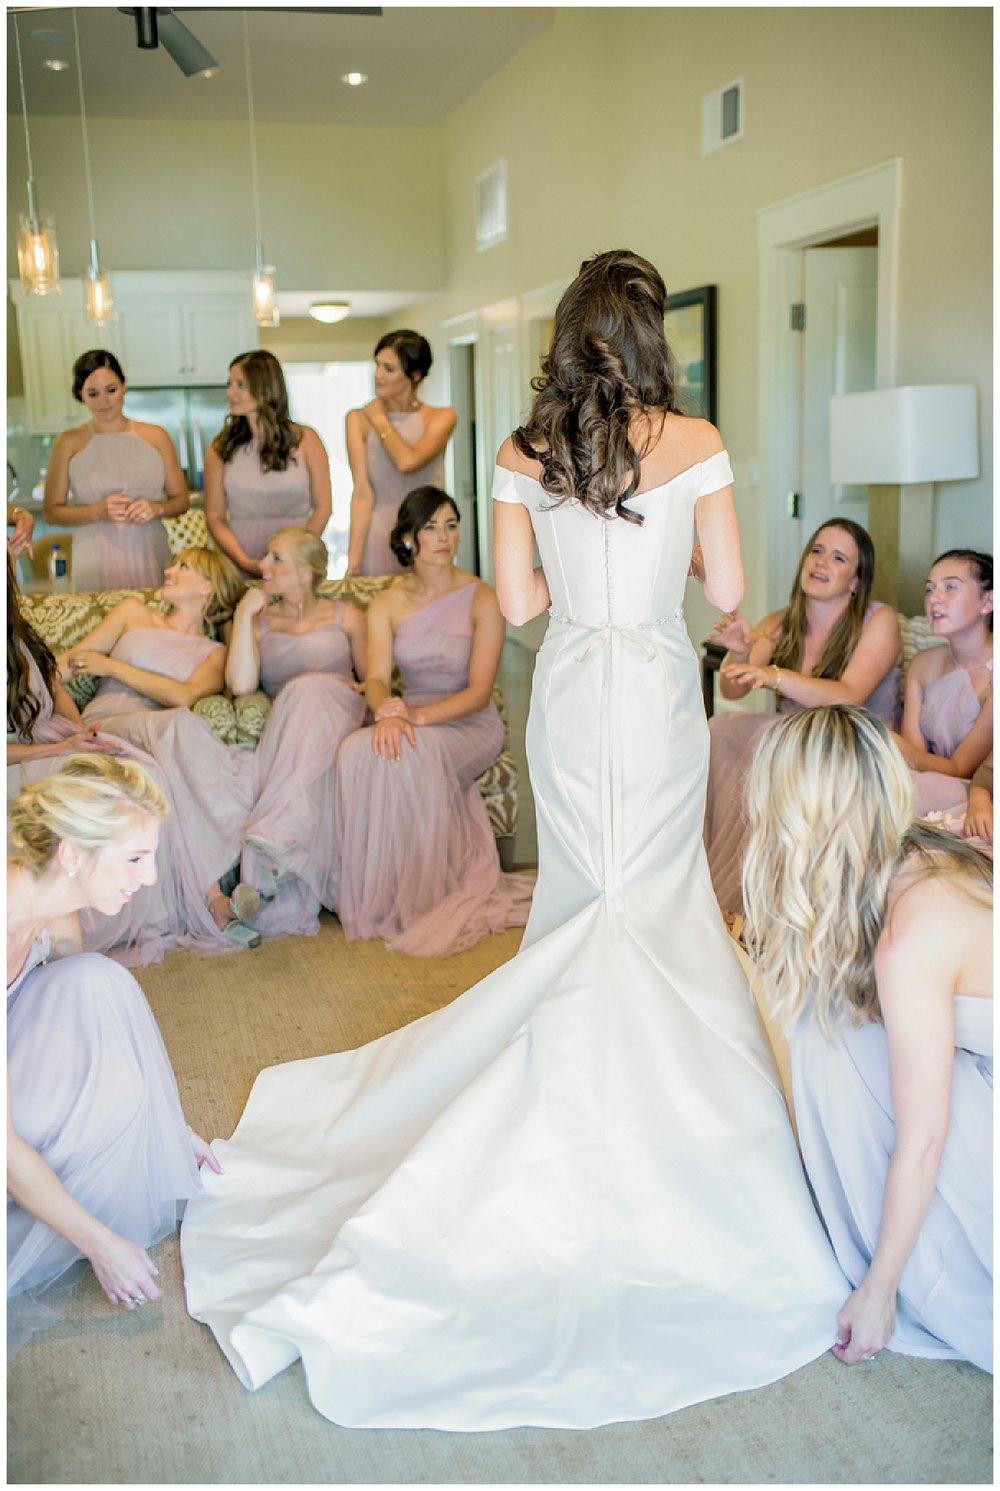 Janine_Licare_Photography_San_Francisco_Wedding_Photographer_0135.jpg